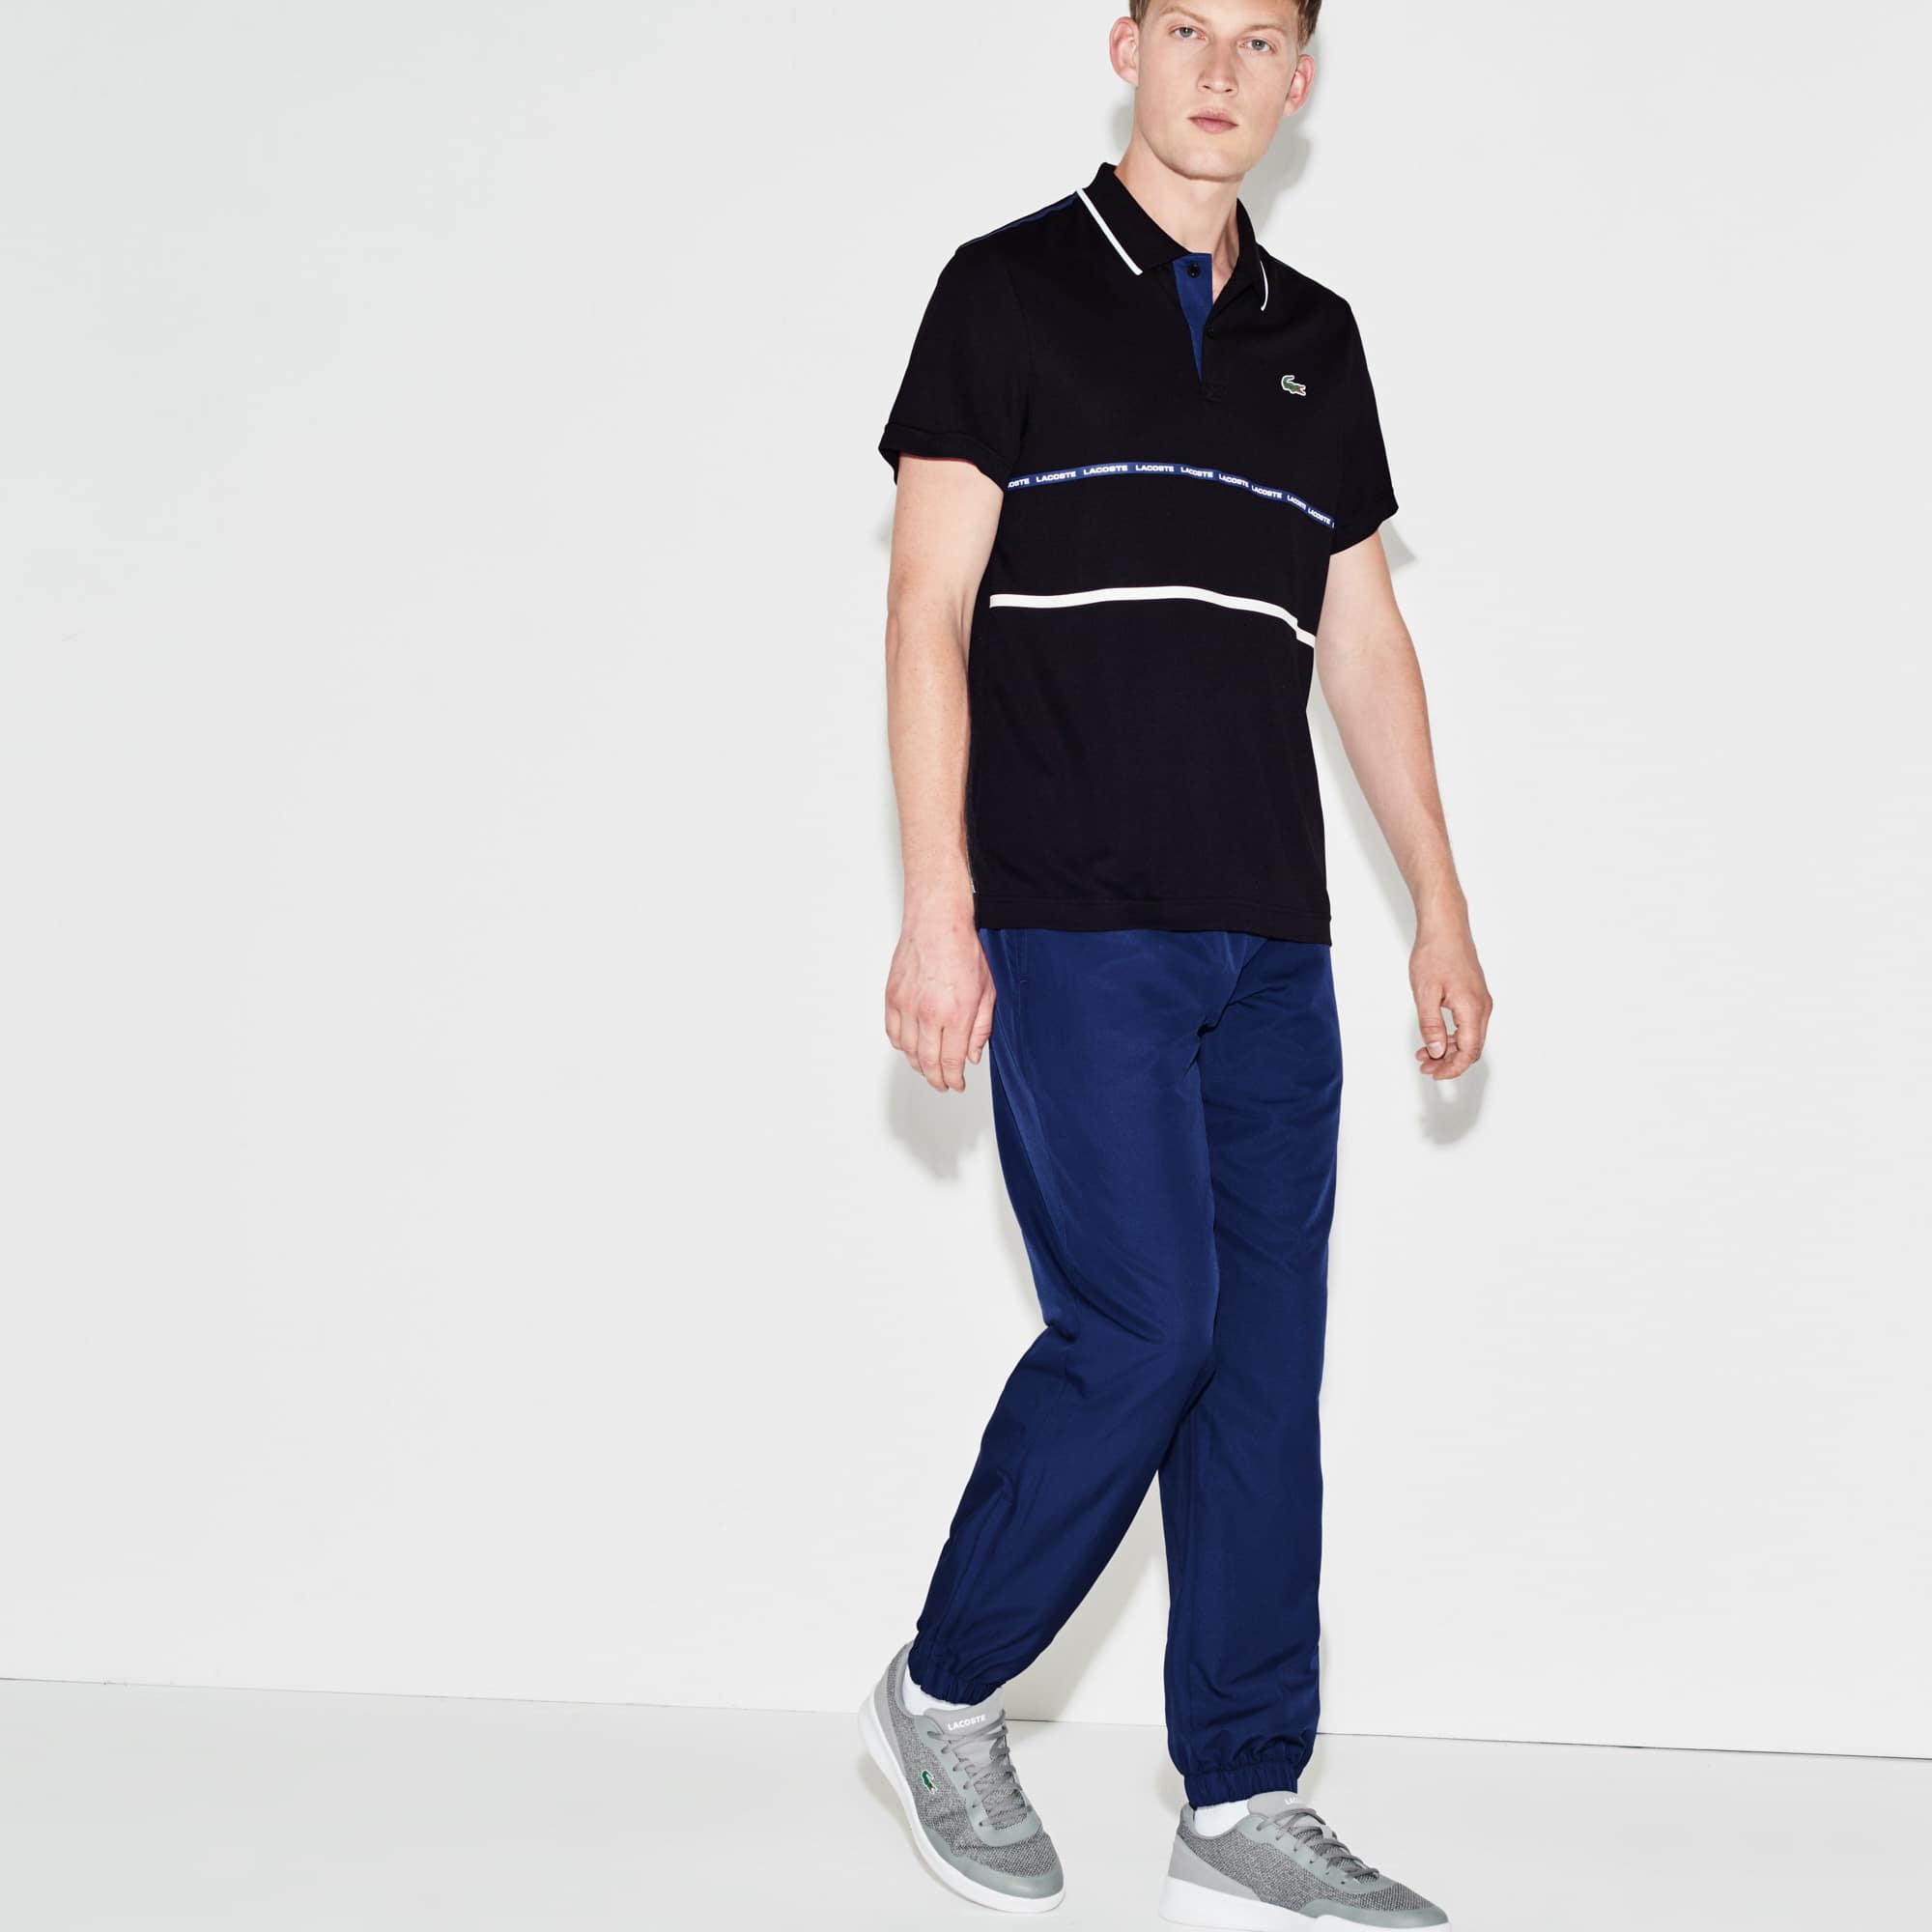 Pantaloni da ginnastica Lacoste SPORT in taffettà tessuto a losanghe in tinta unita